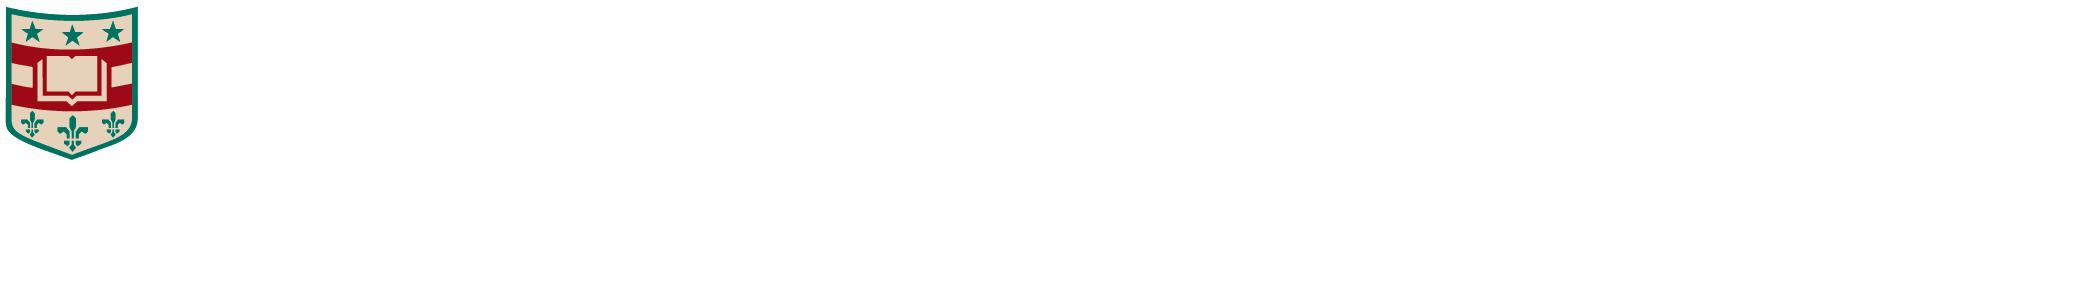 Washington University in St. Louis School of Law Logoheader